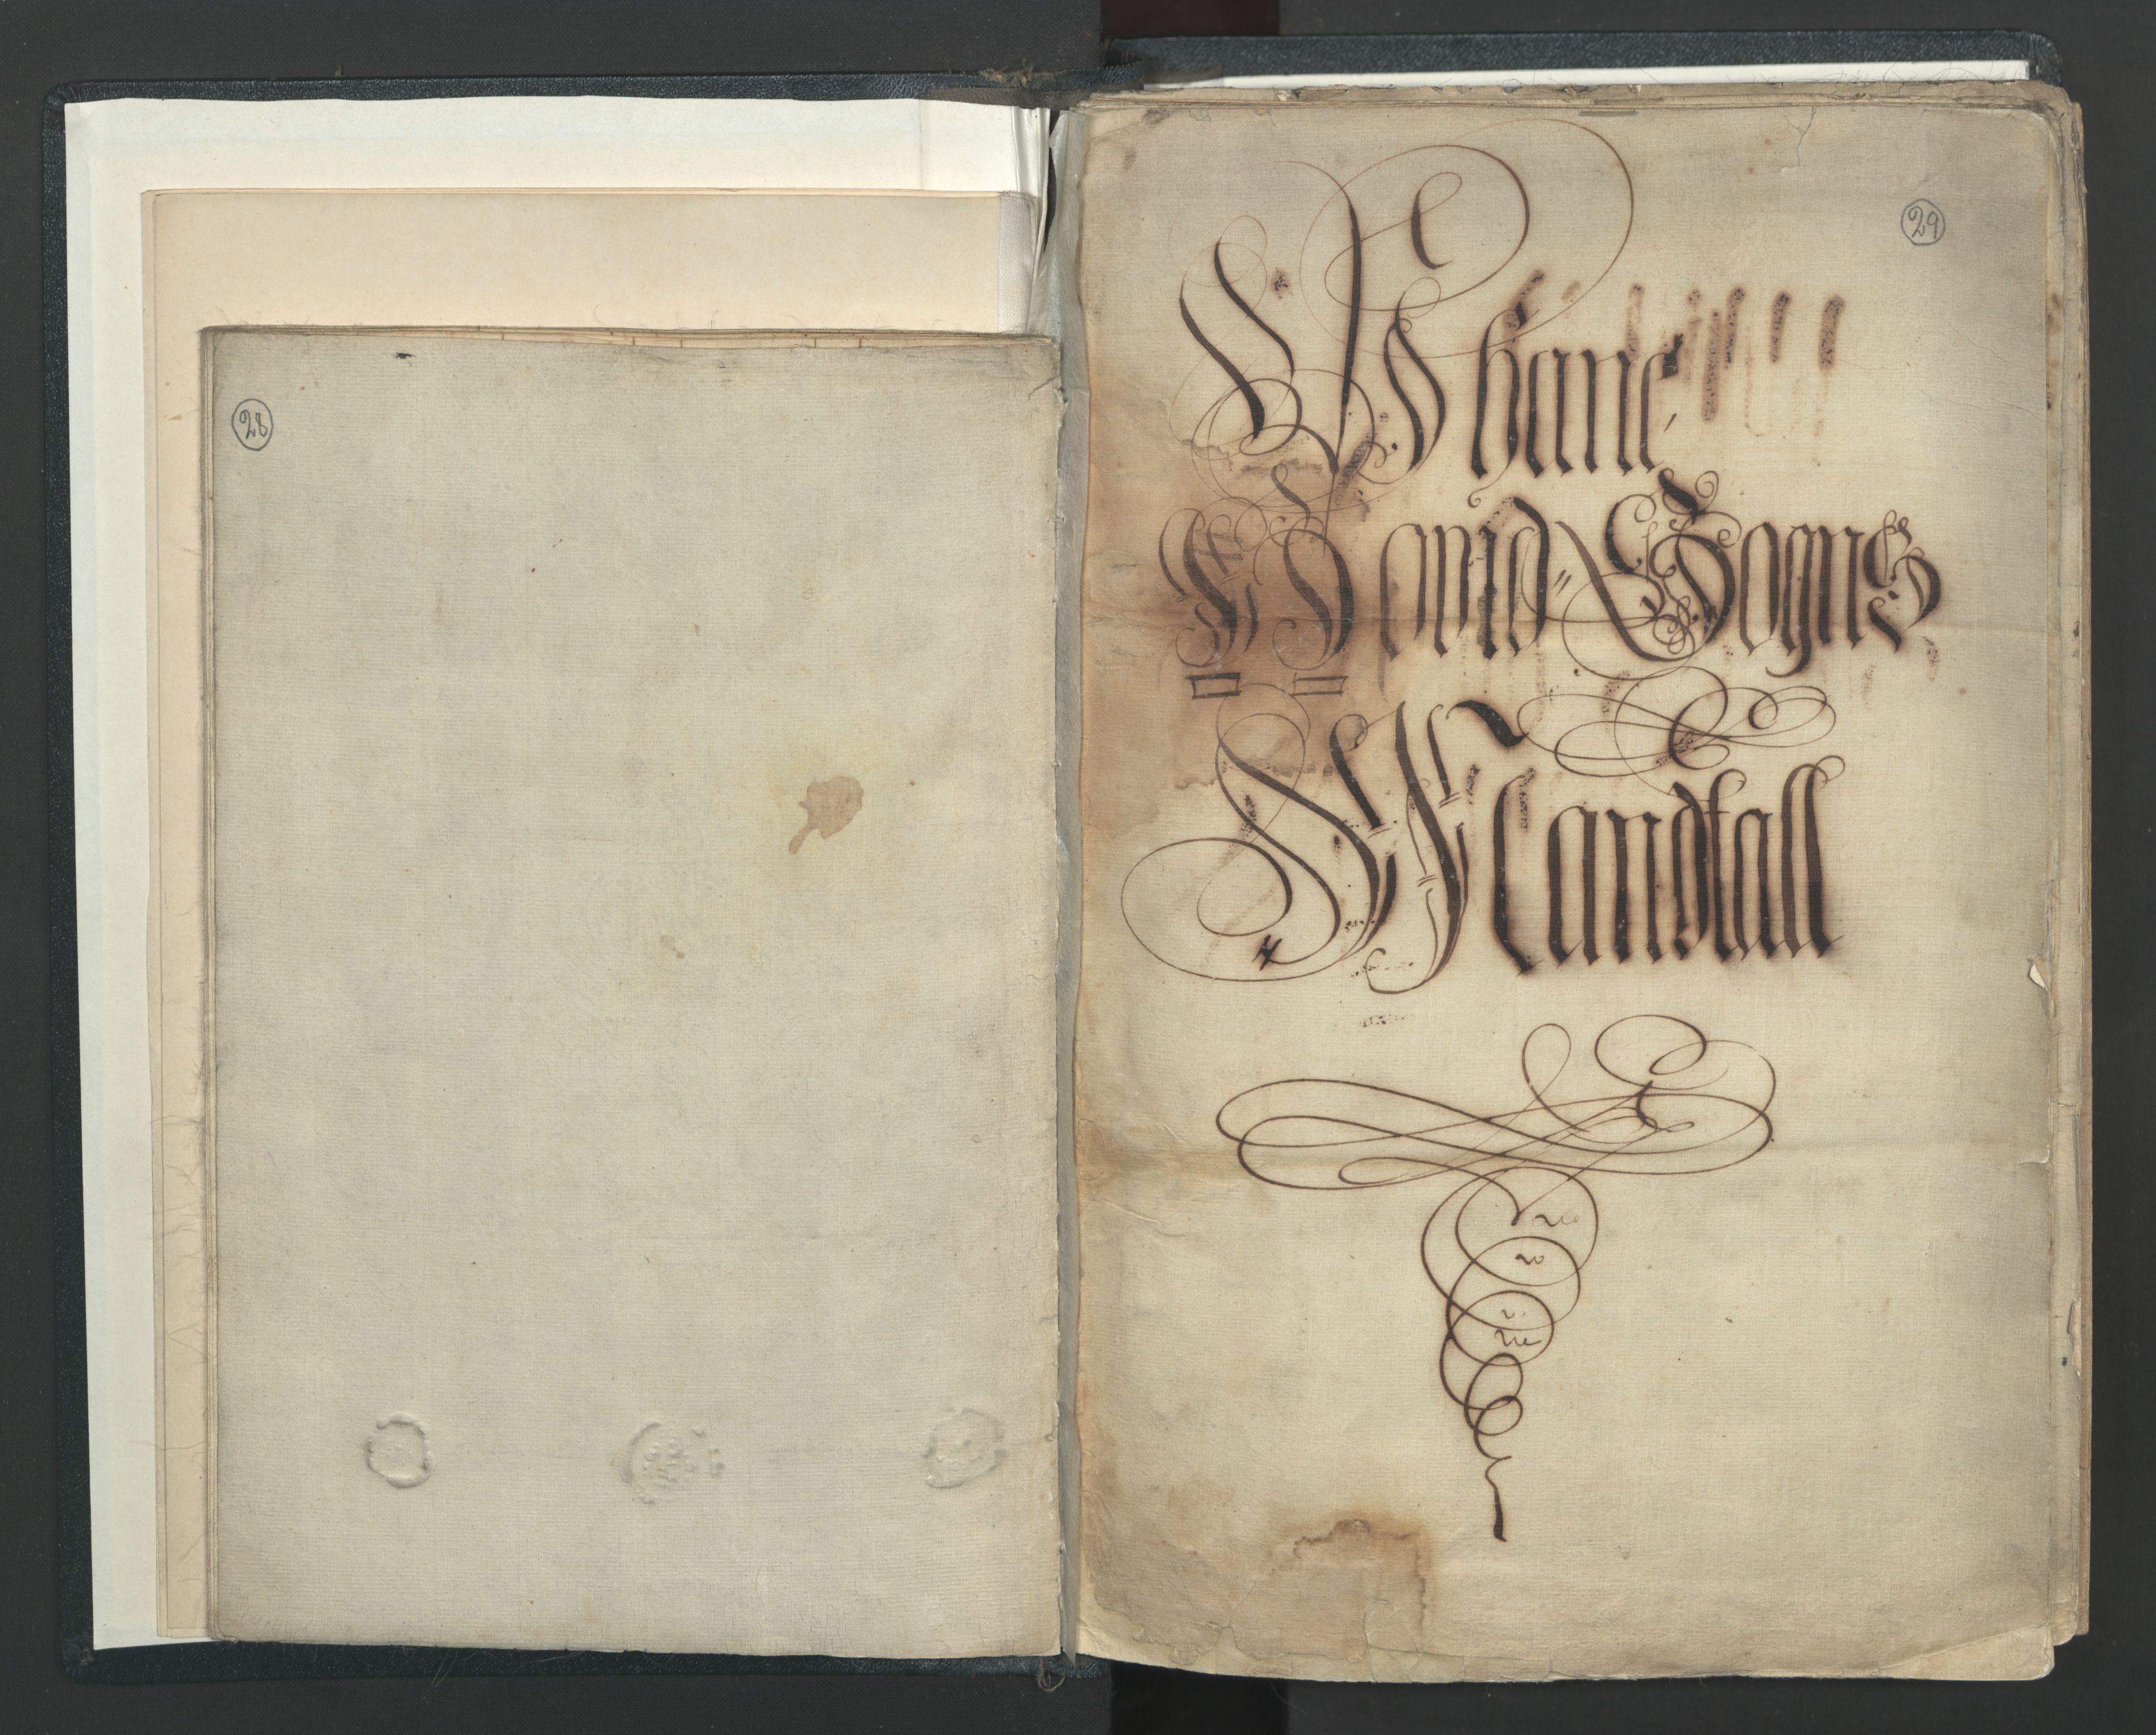 RA, Manntallet 1701, nr. 7: Nordhordland og Voss fogderi, 1701, s. 28-29